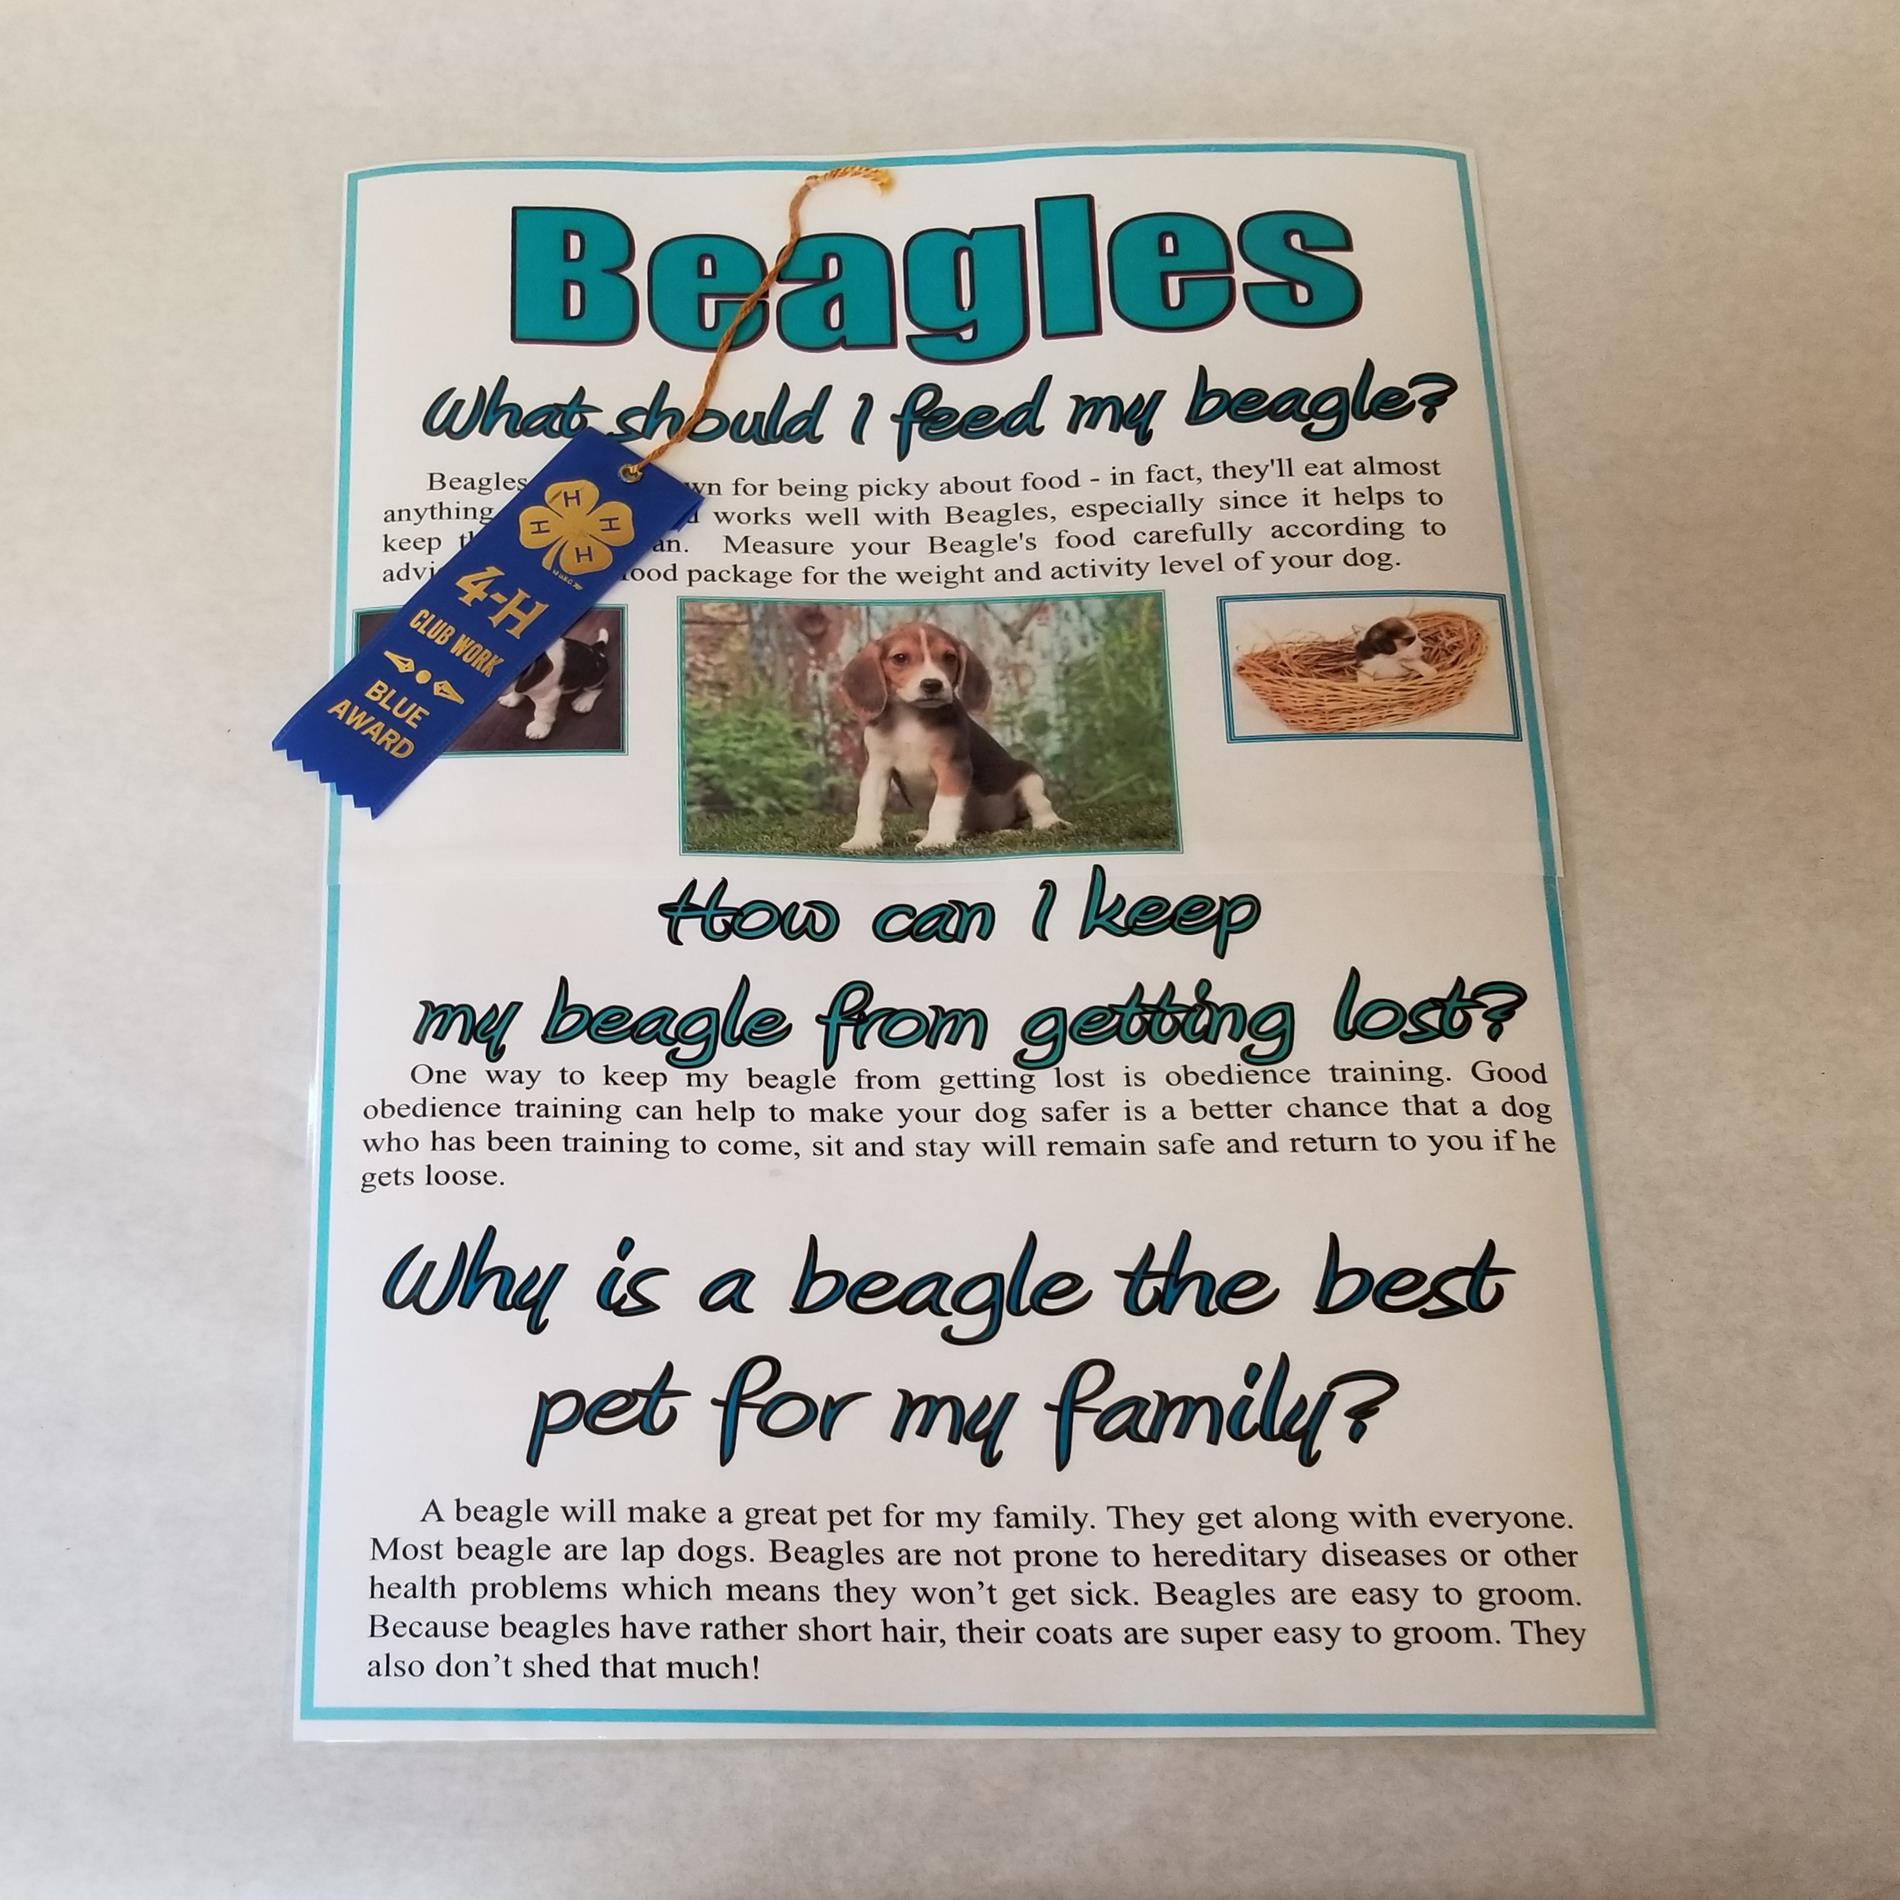 Paula, Beagles